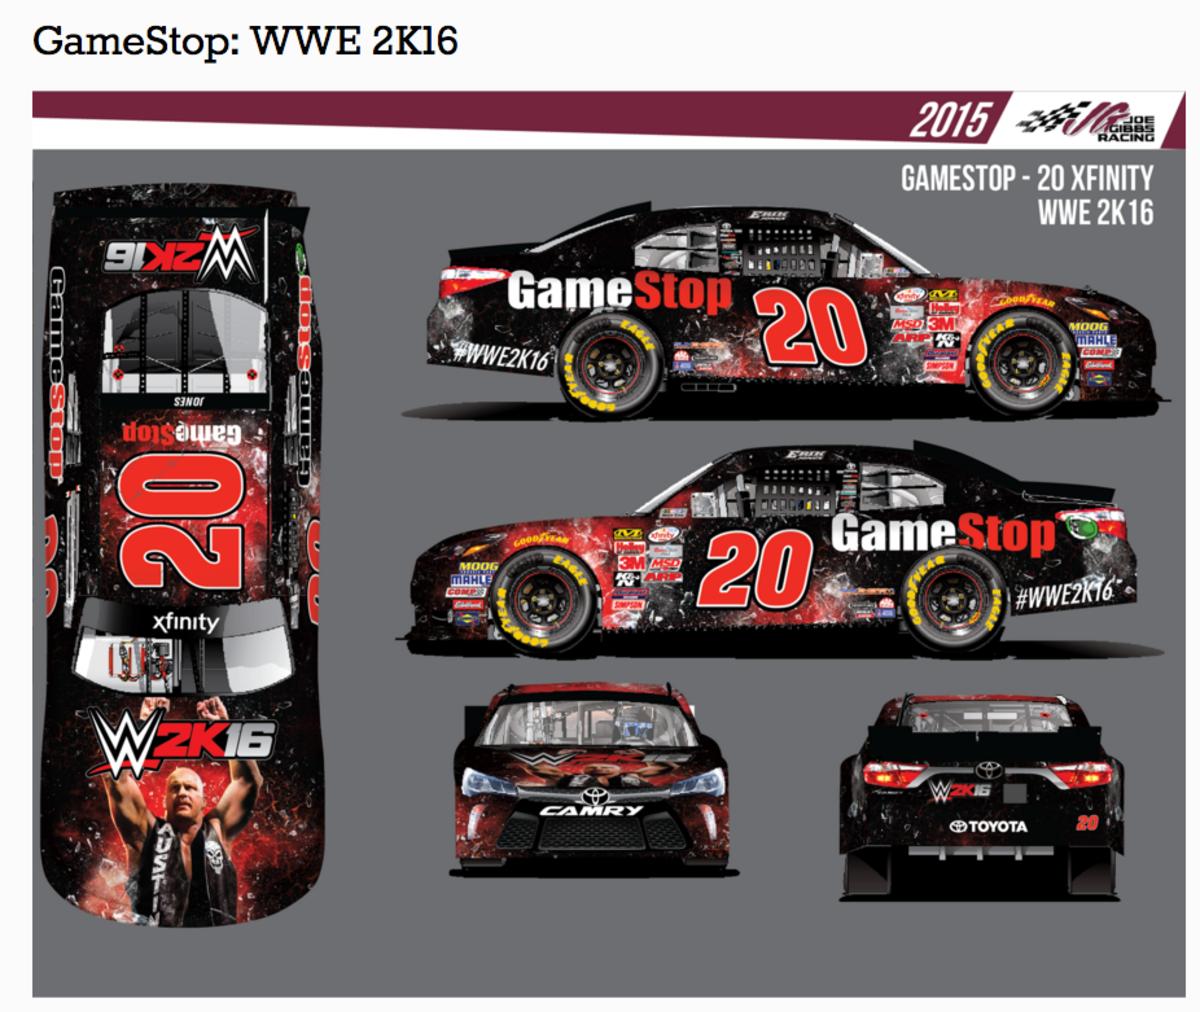 WWE 2K16 Race Car